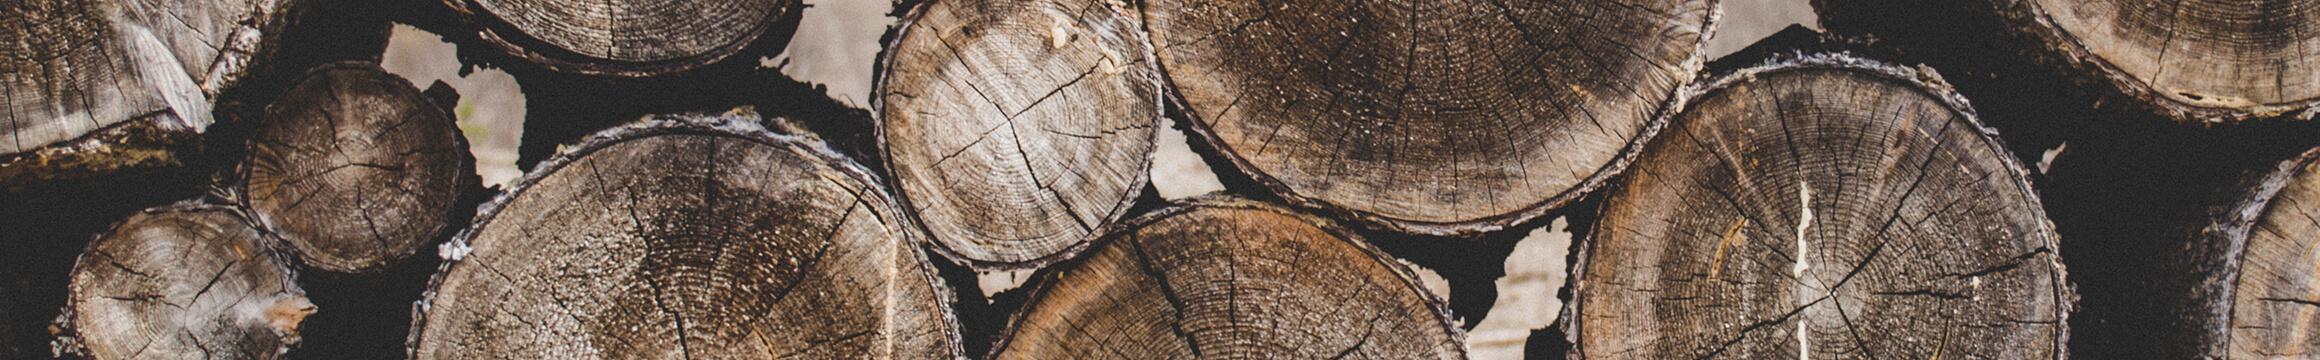 Wood Rustic 04